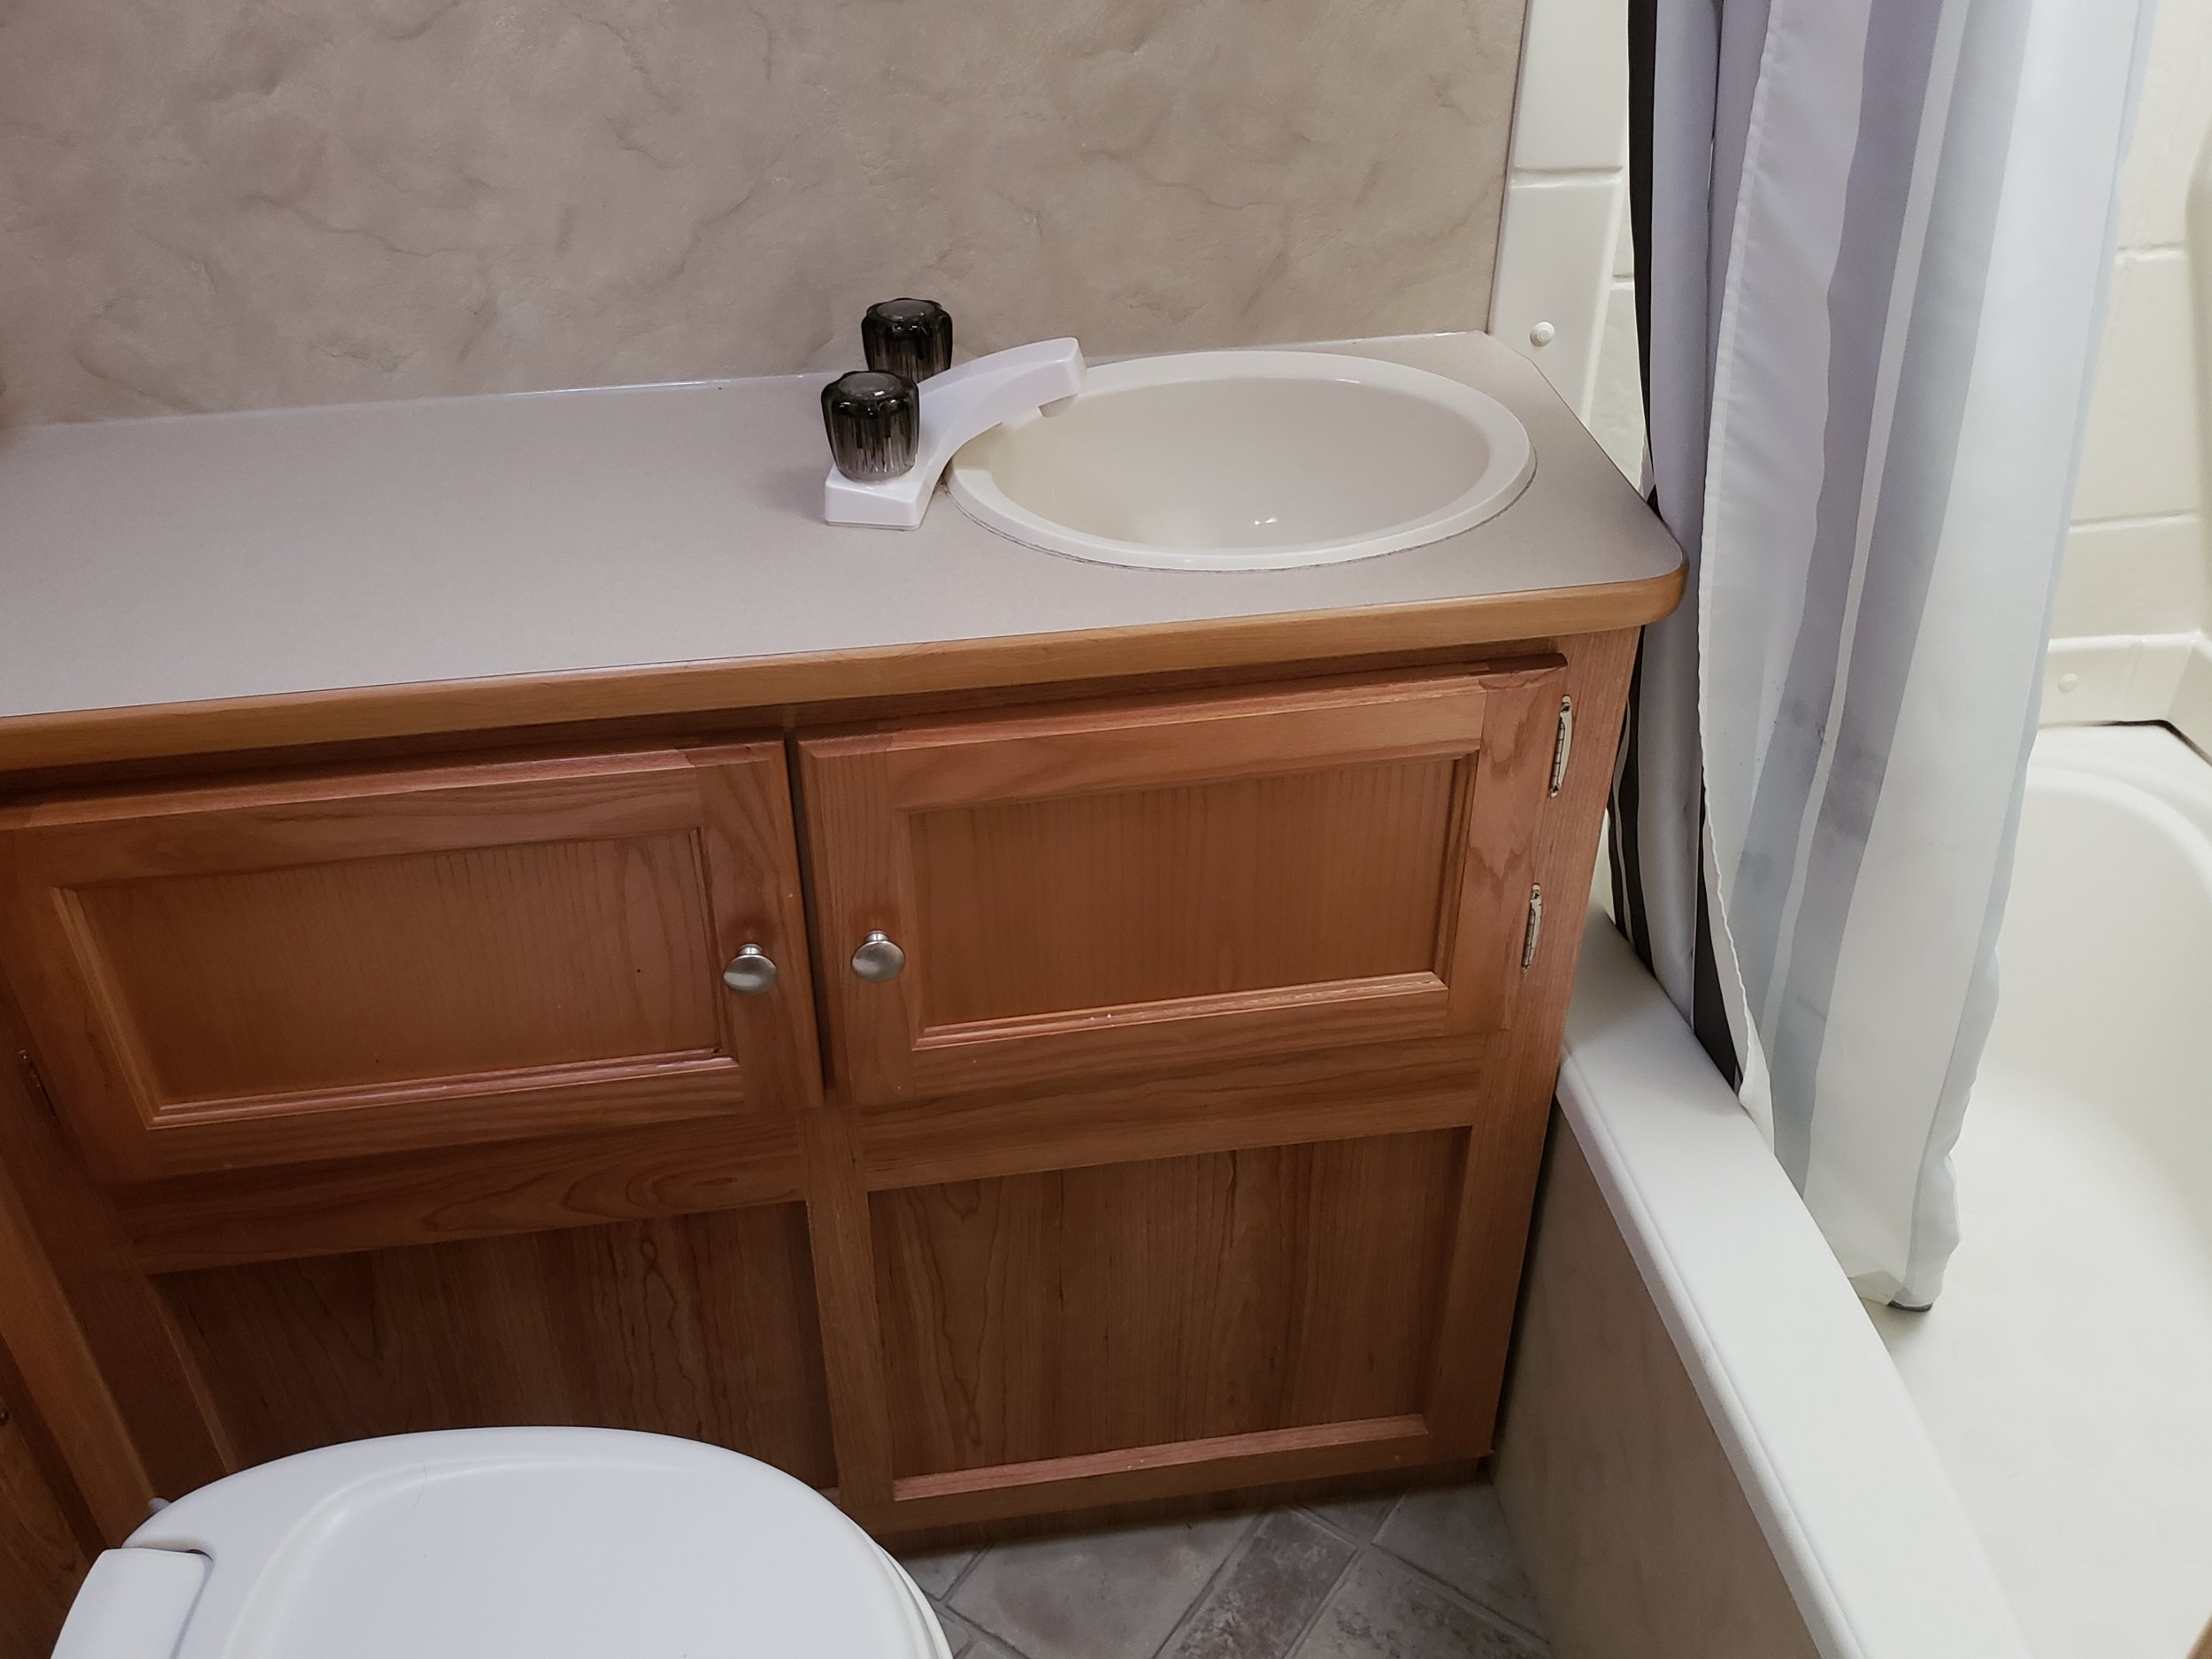 2011 Trail Sports - Bathroom.jpg